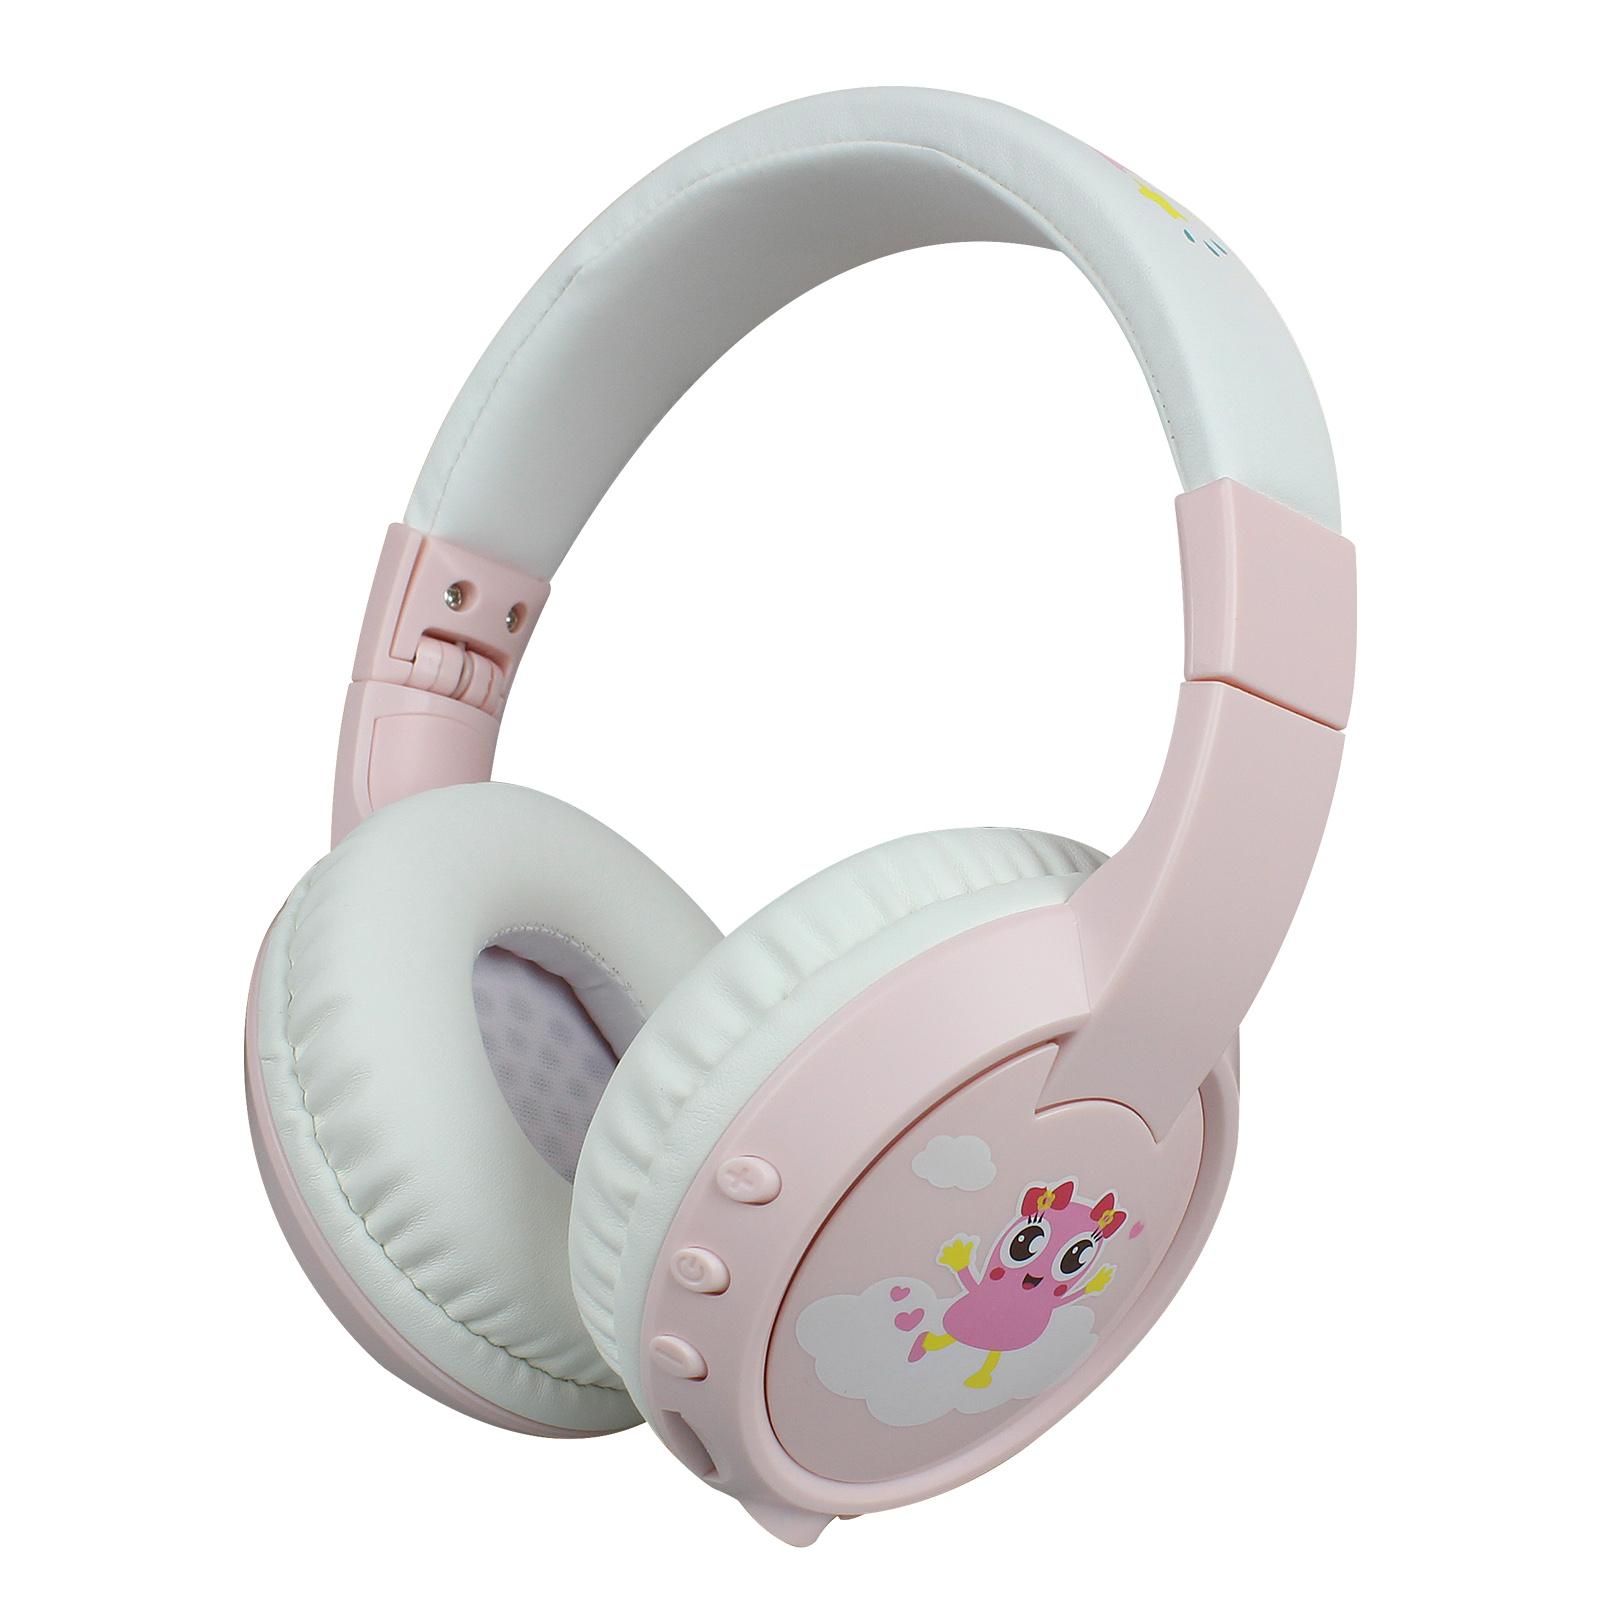 Children Bluetooth Headset BT5.0 Wireless Kids Headphone with HD Mic Support TF Card for Children Study/Entertainment Pink